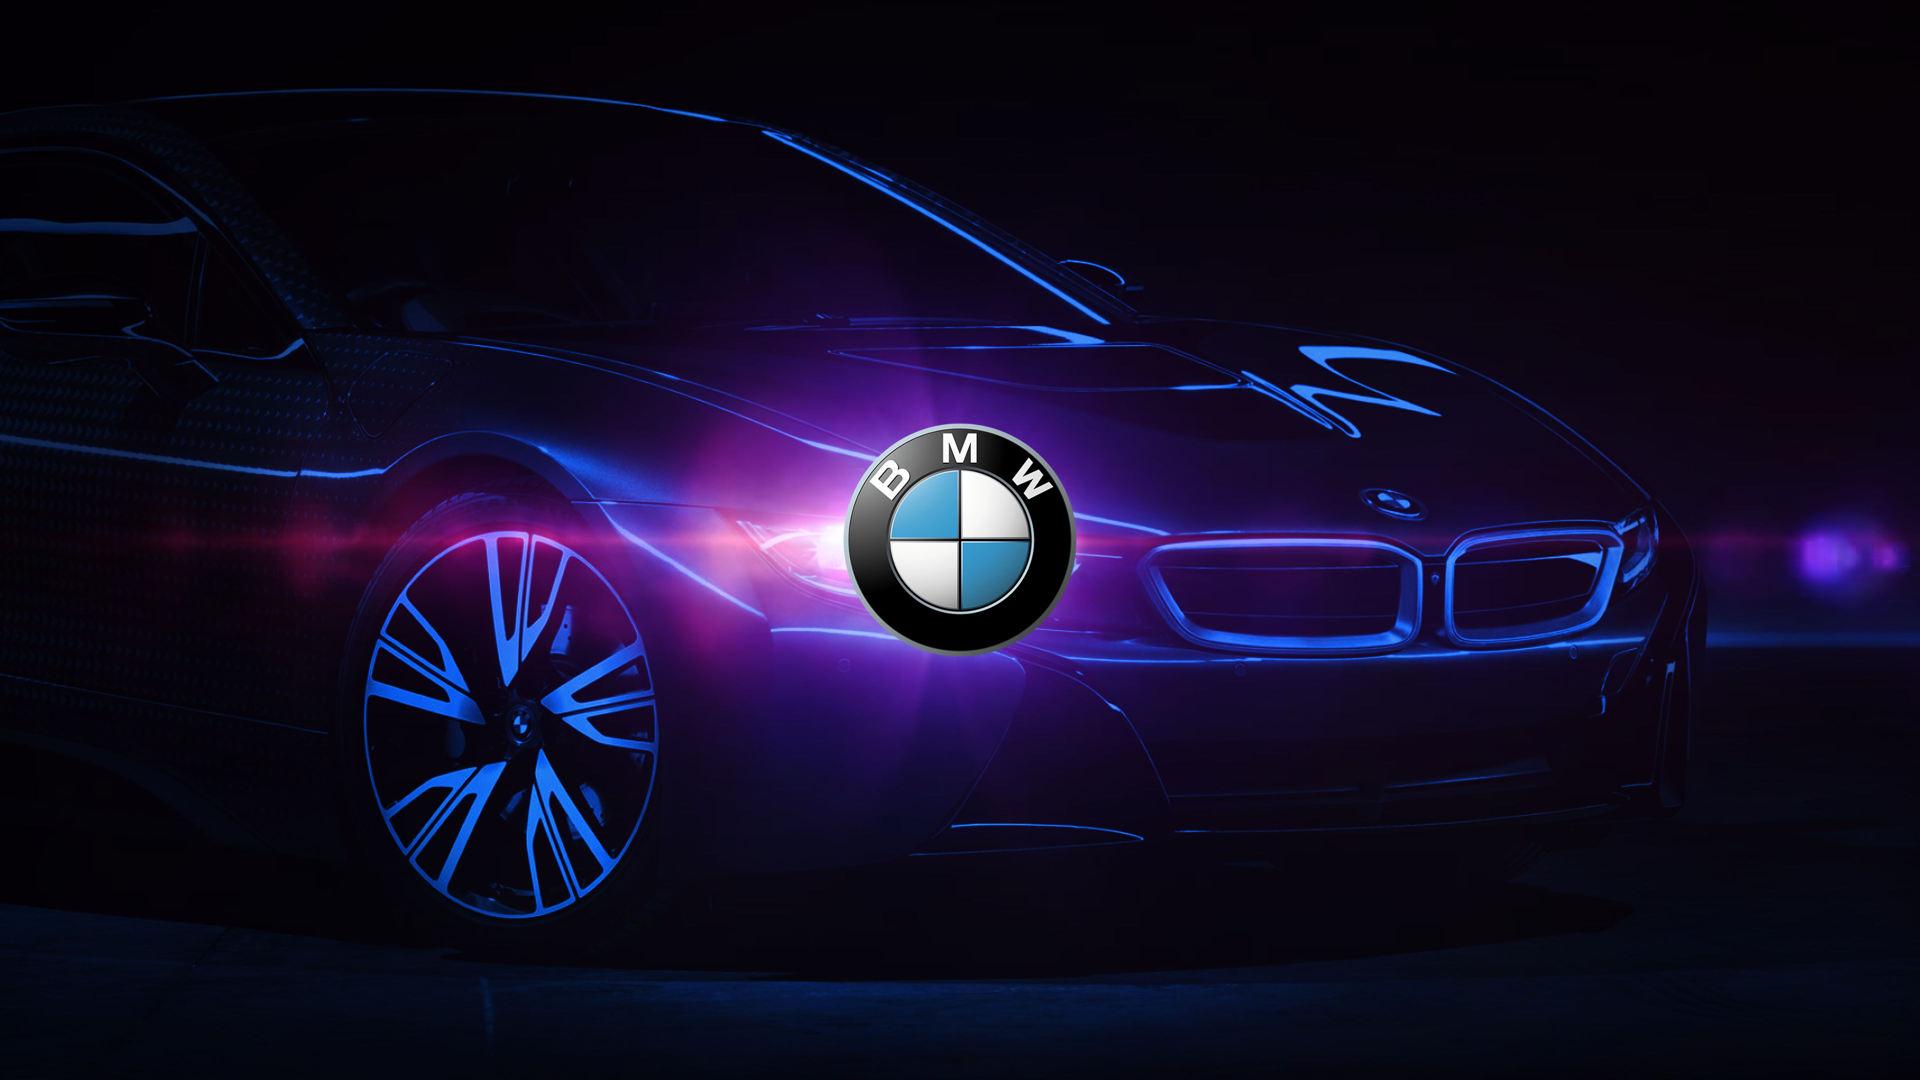 BMW Car Background Images